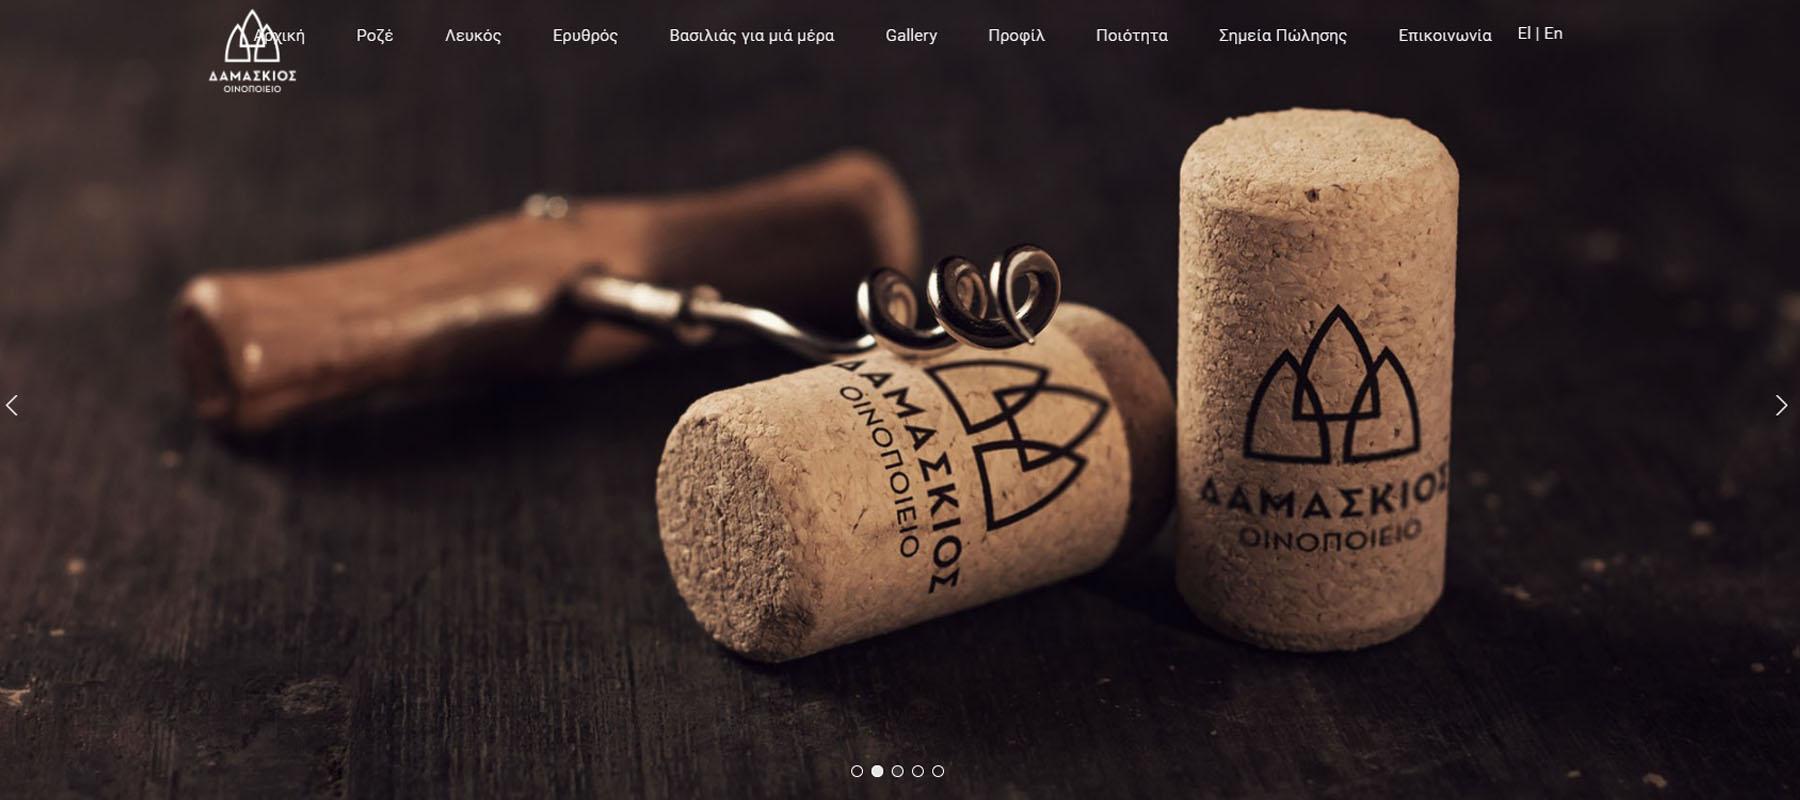 Damaskios Winery